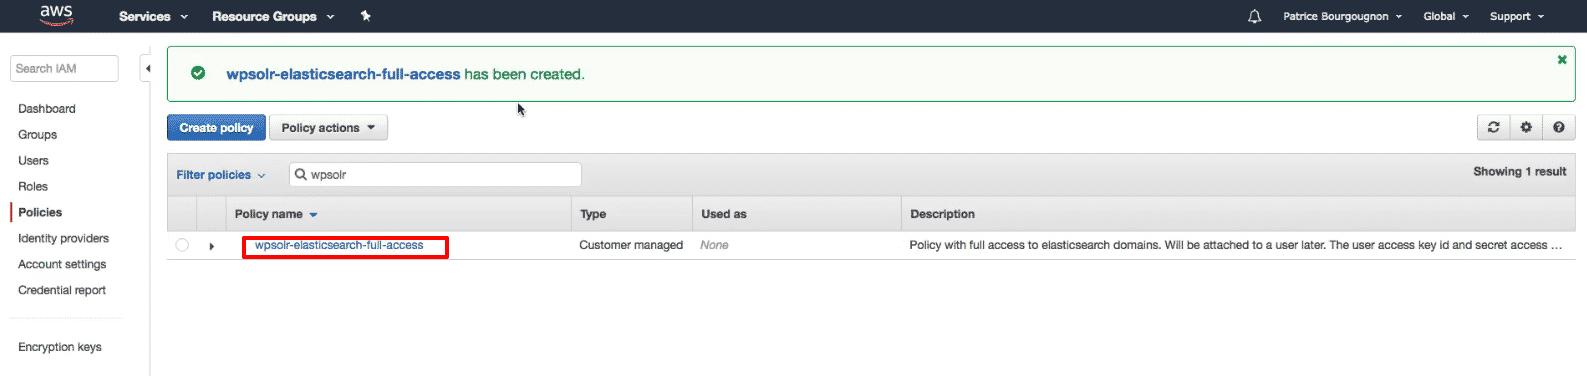 Amazon Elasticsearch: new policy created